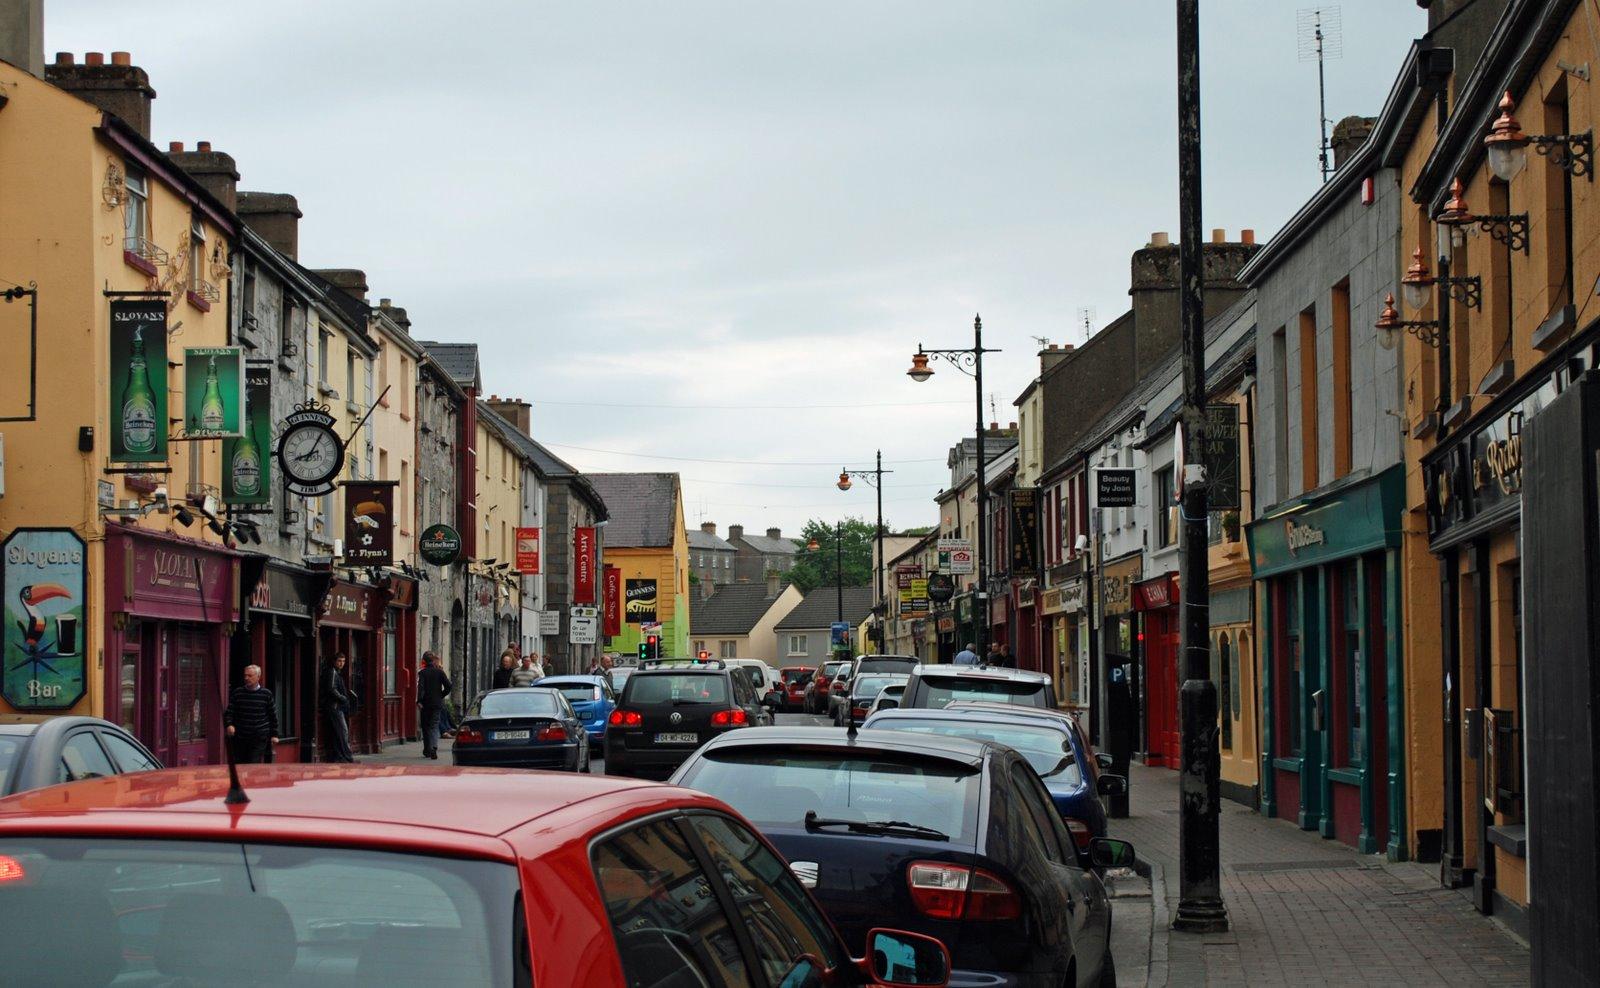 linenhall, castlebar